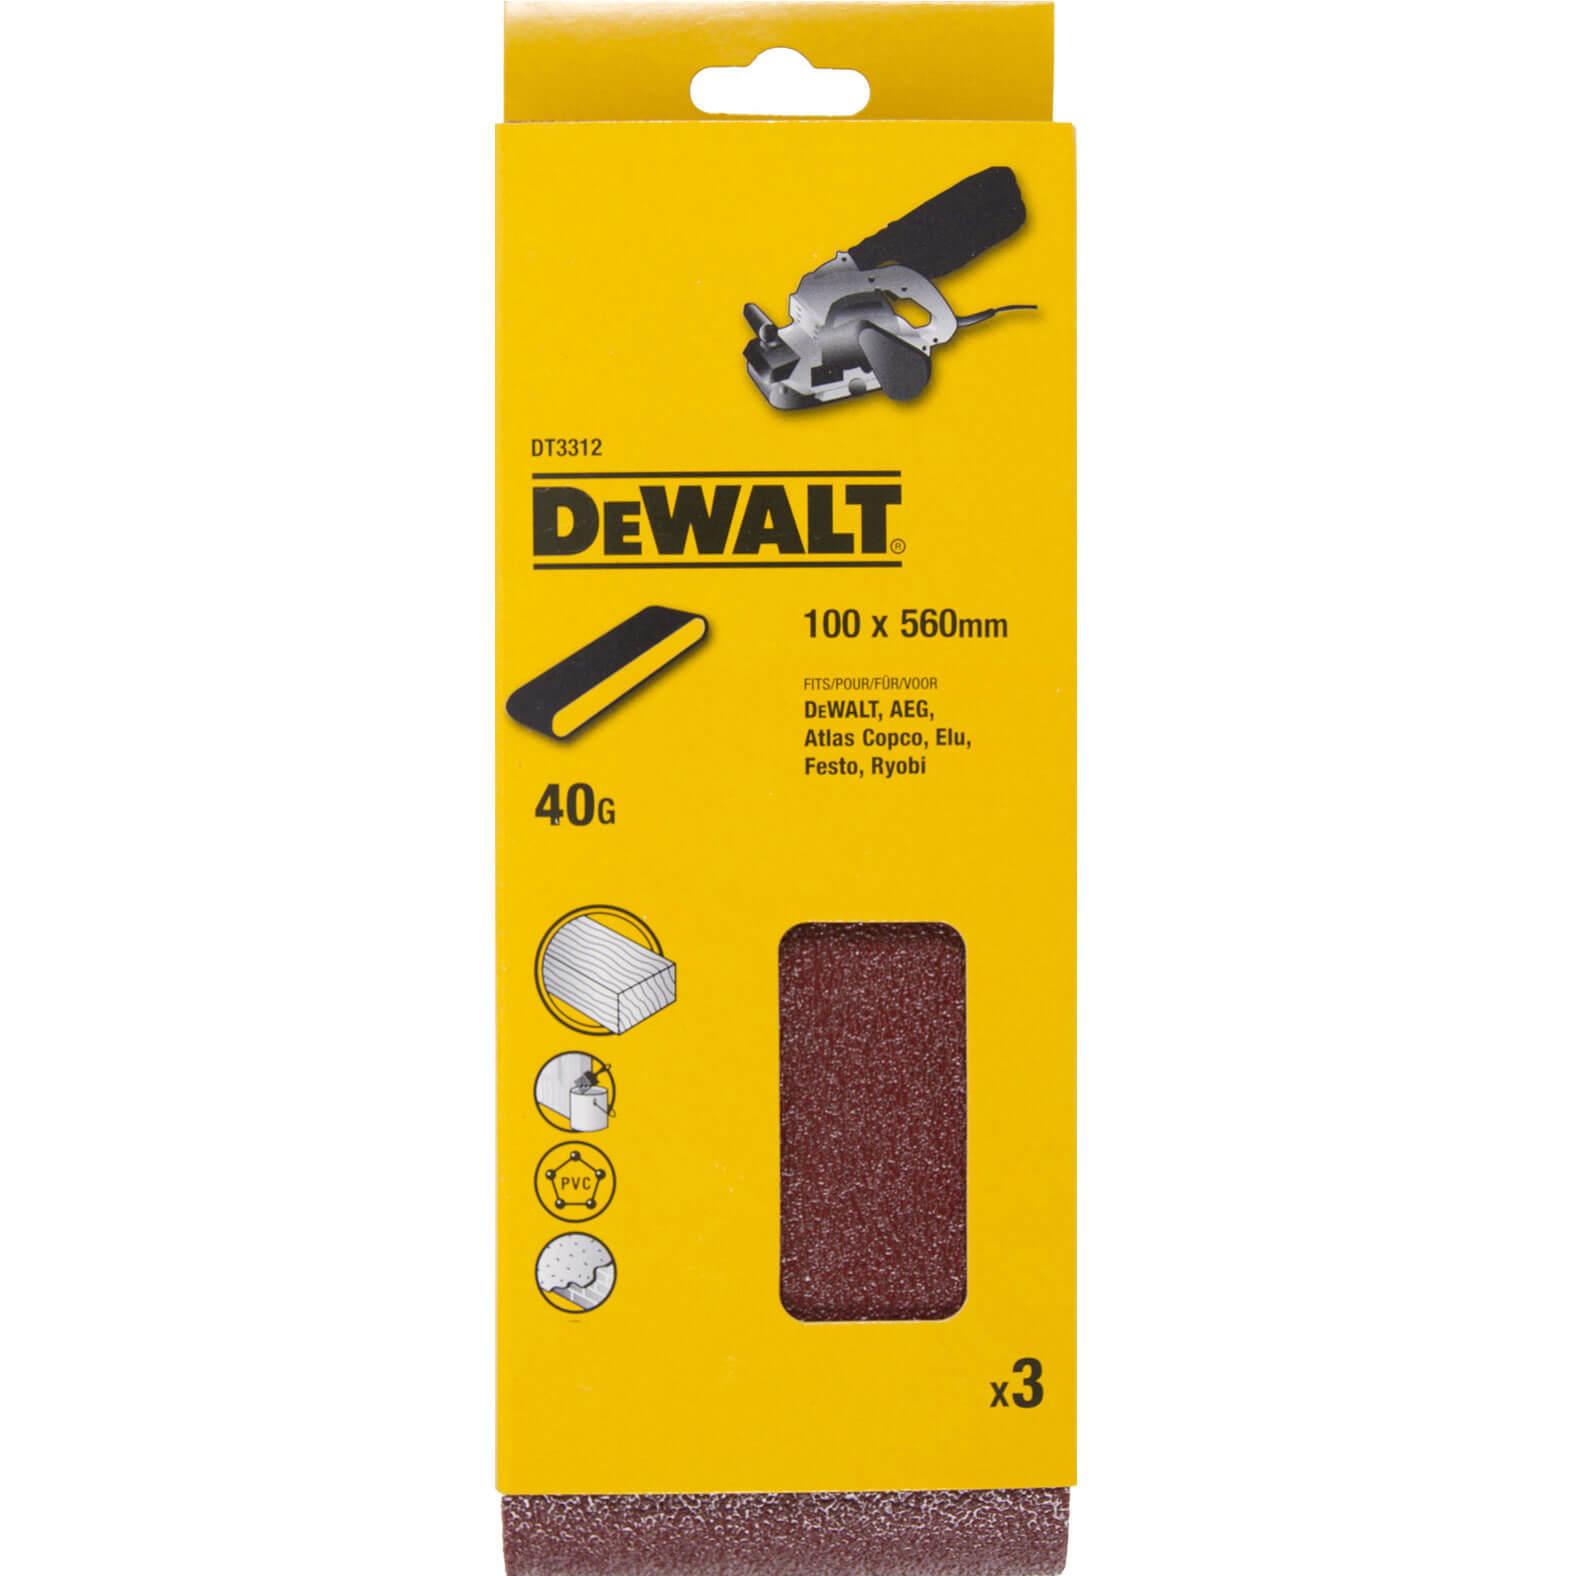 Image of DeWalt 100 x 560mm Multi Purpose Sanding Belts 100mm x 560mm 40g Pack of 3